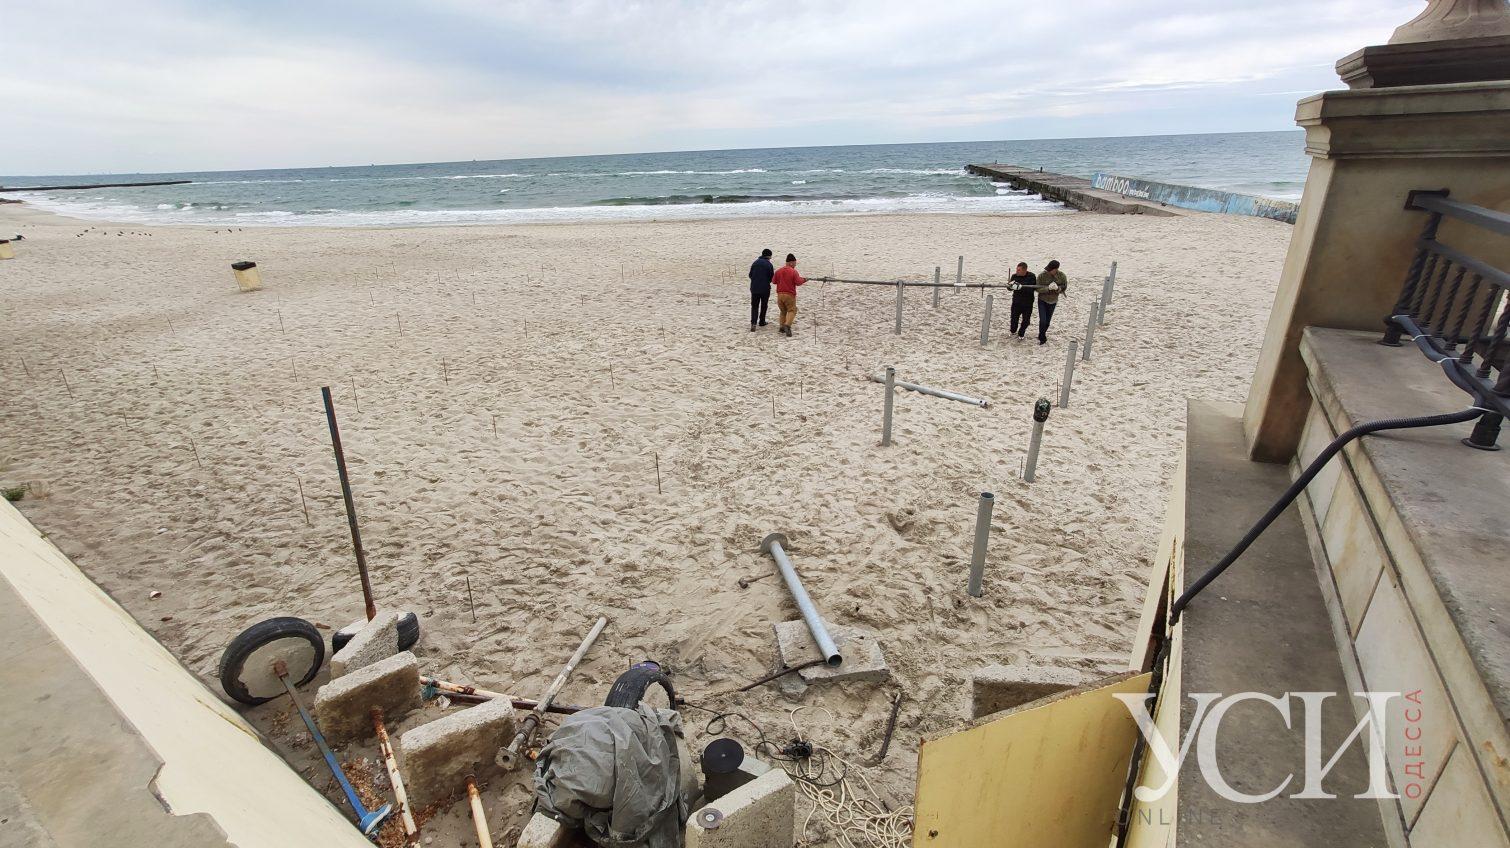 В мэрии согласовали гигантский настил и МАФы на пляже 16-й Фонтана фирме экс-нардепа (фото) «фото»